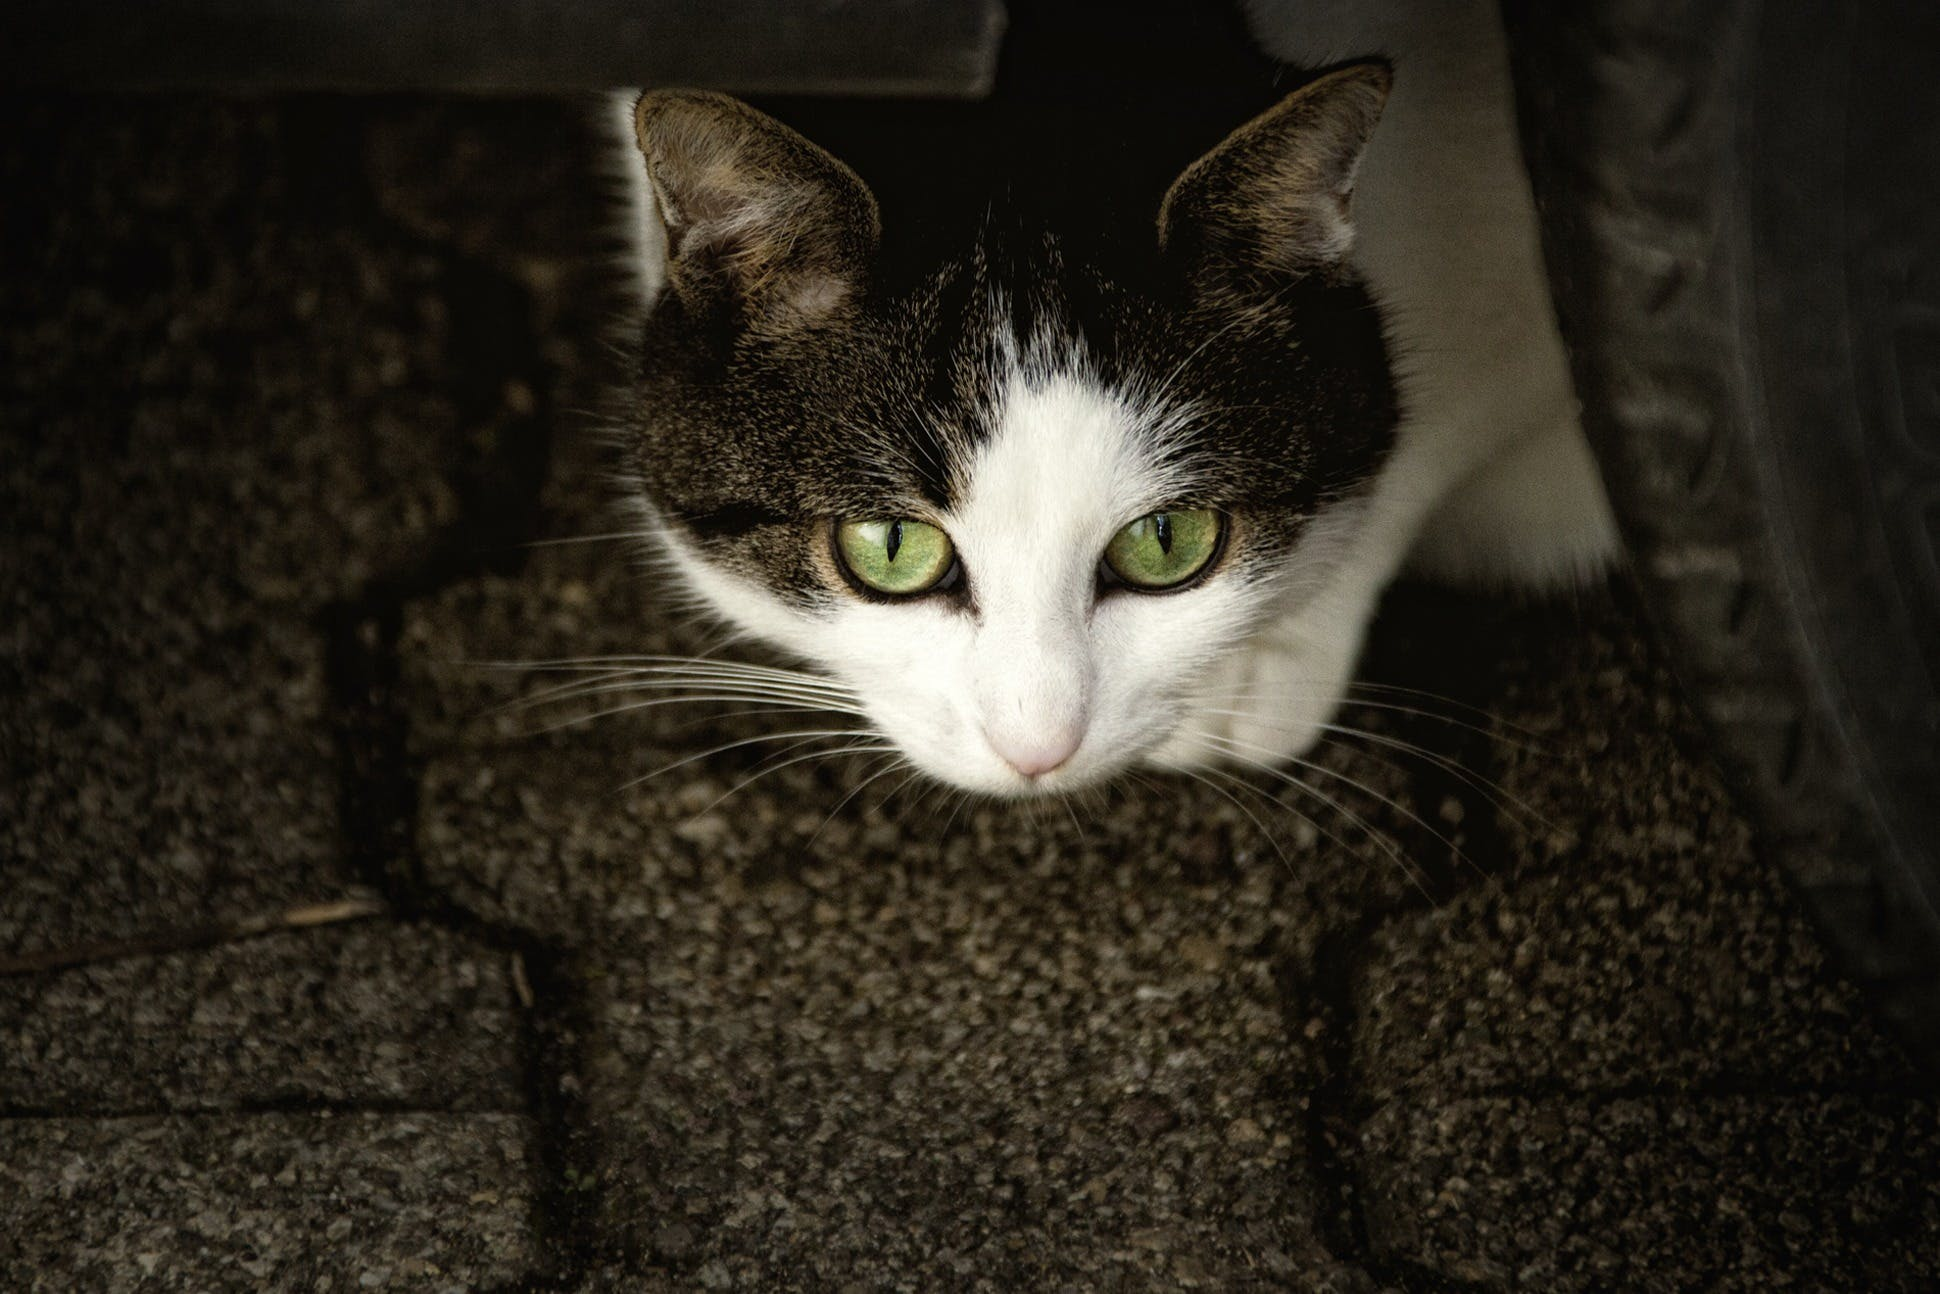 Black and White Cat Near